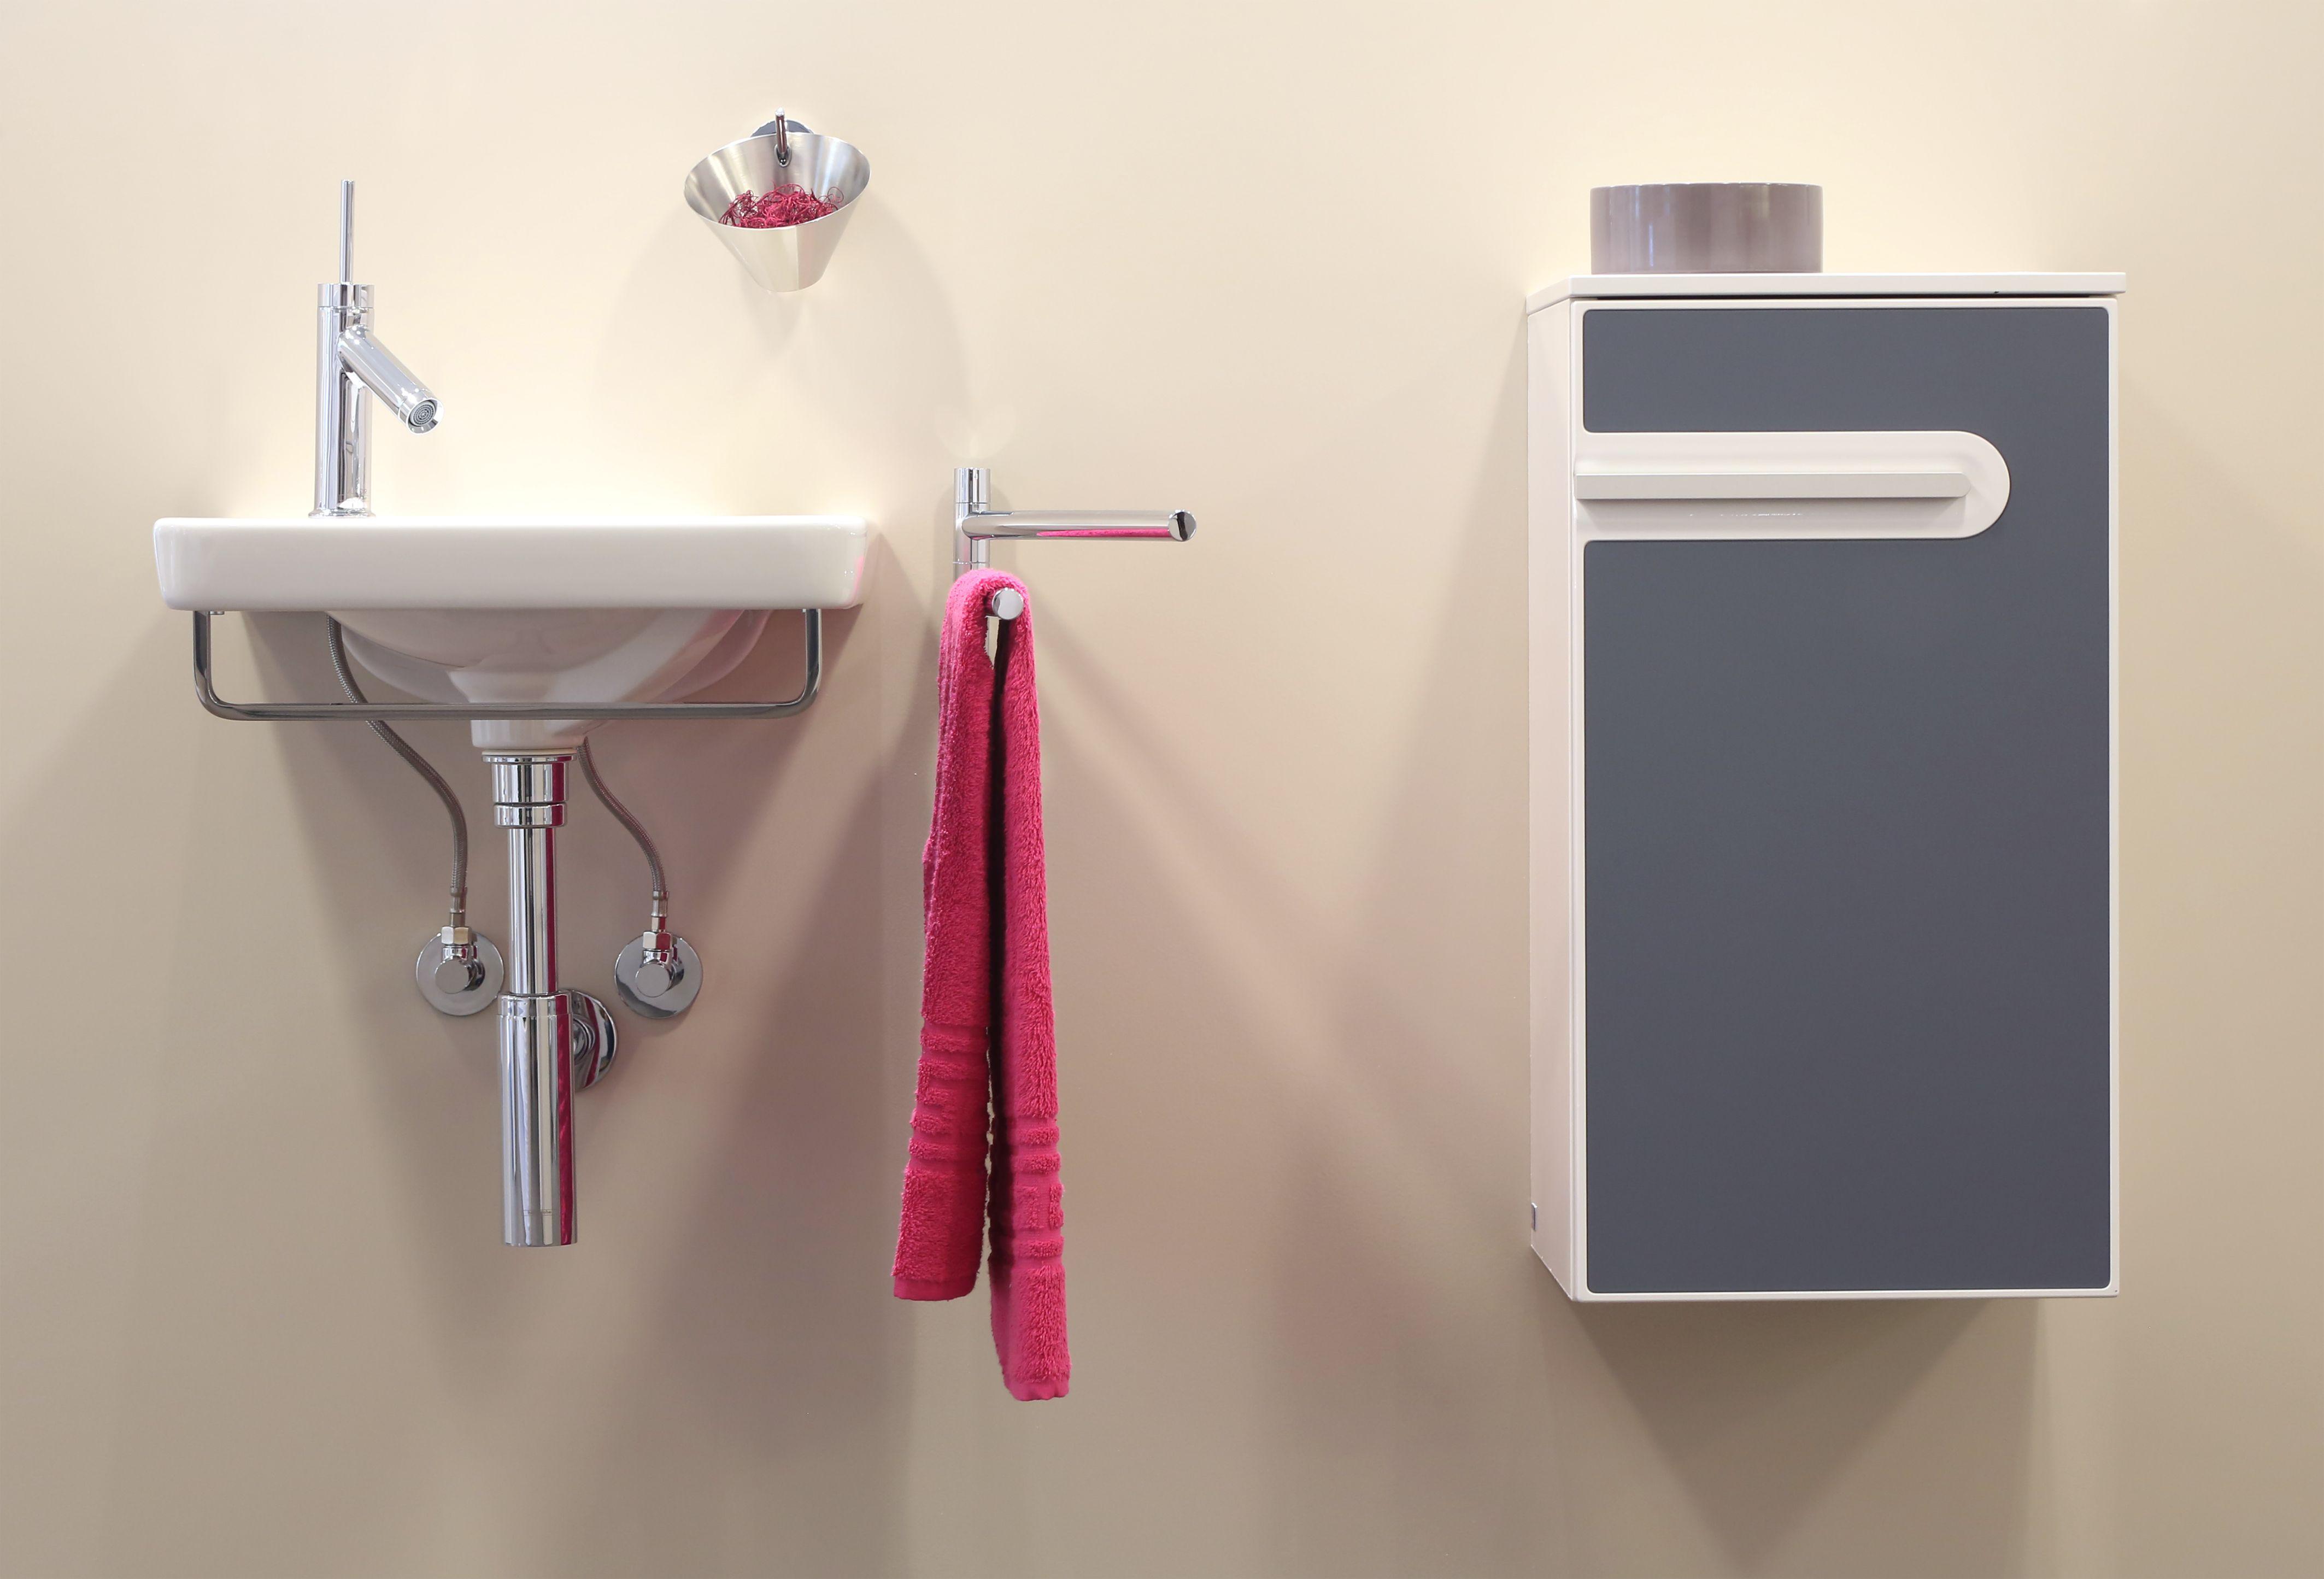 Badezimmer-dekor-sets badcomfort ausstellung bei wesemeyer in pinneberg  pinneberg